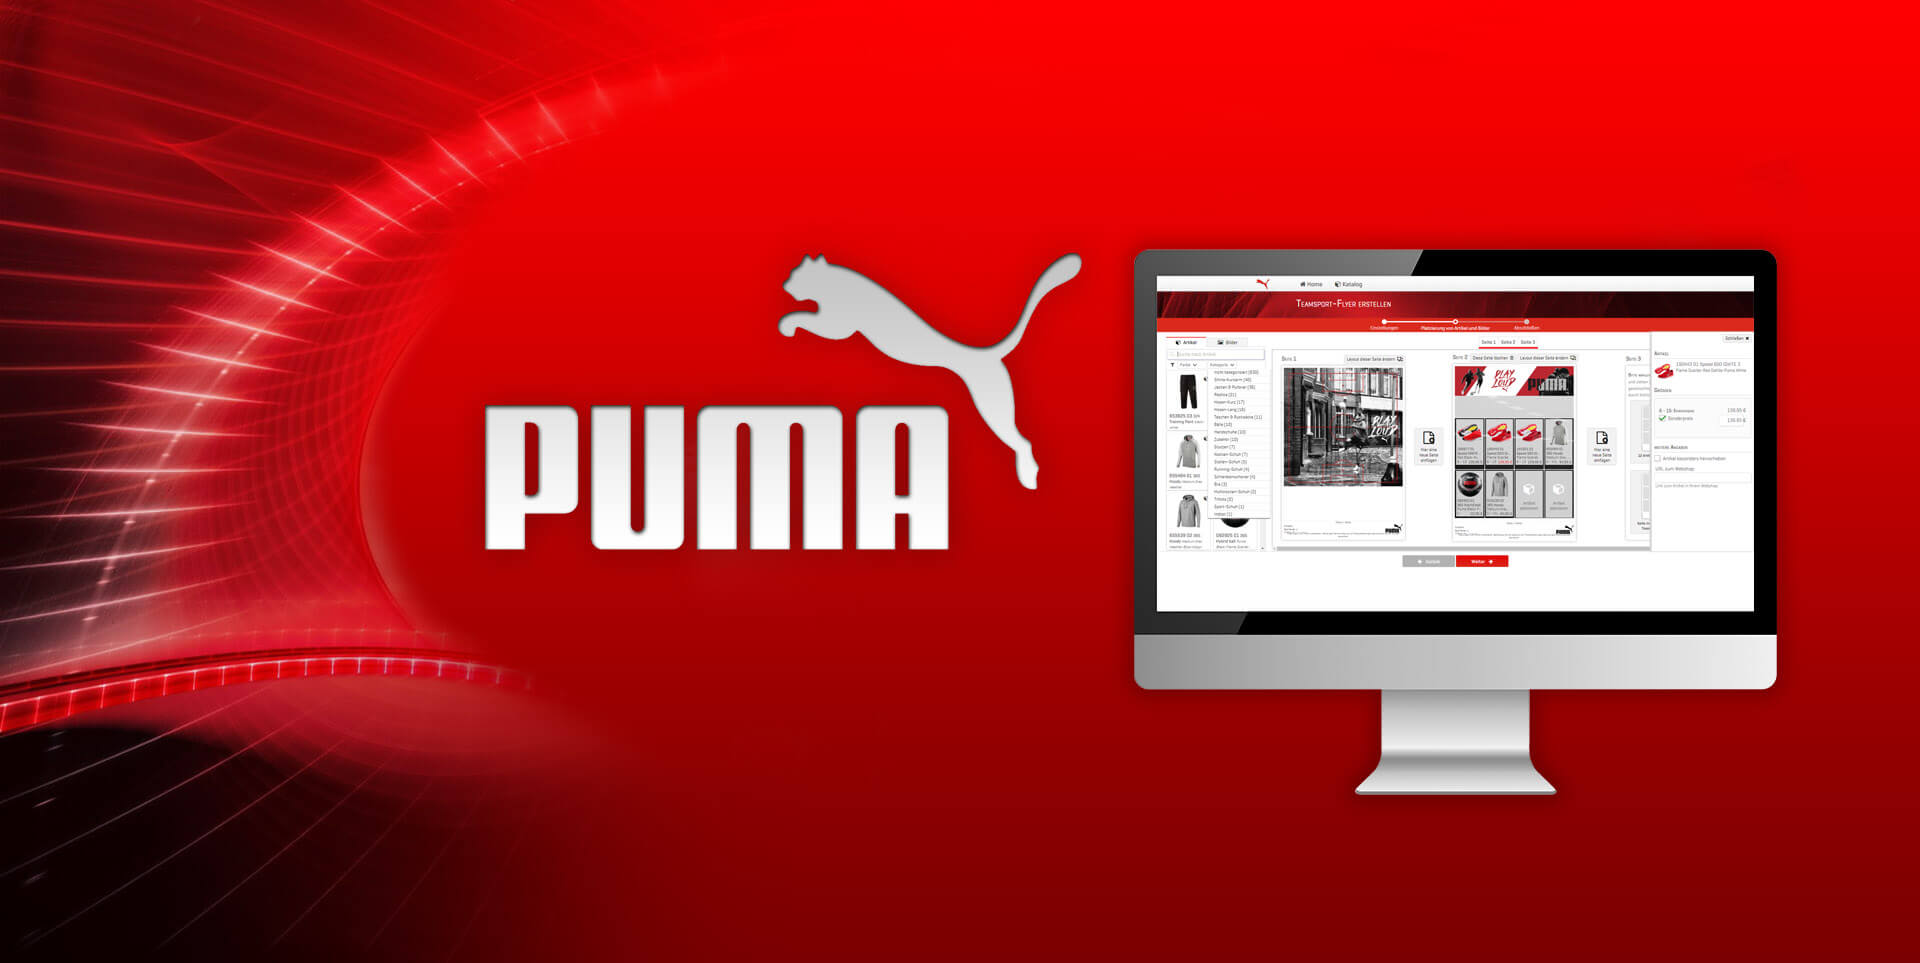 B2B E Business PUMA Screen